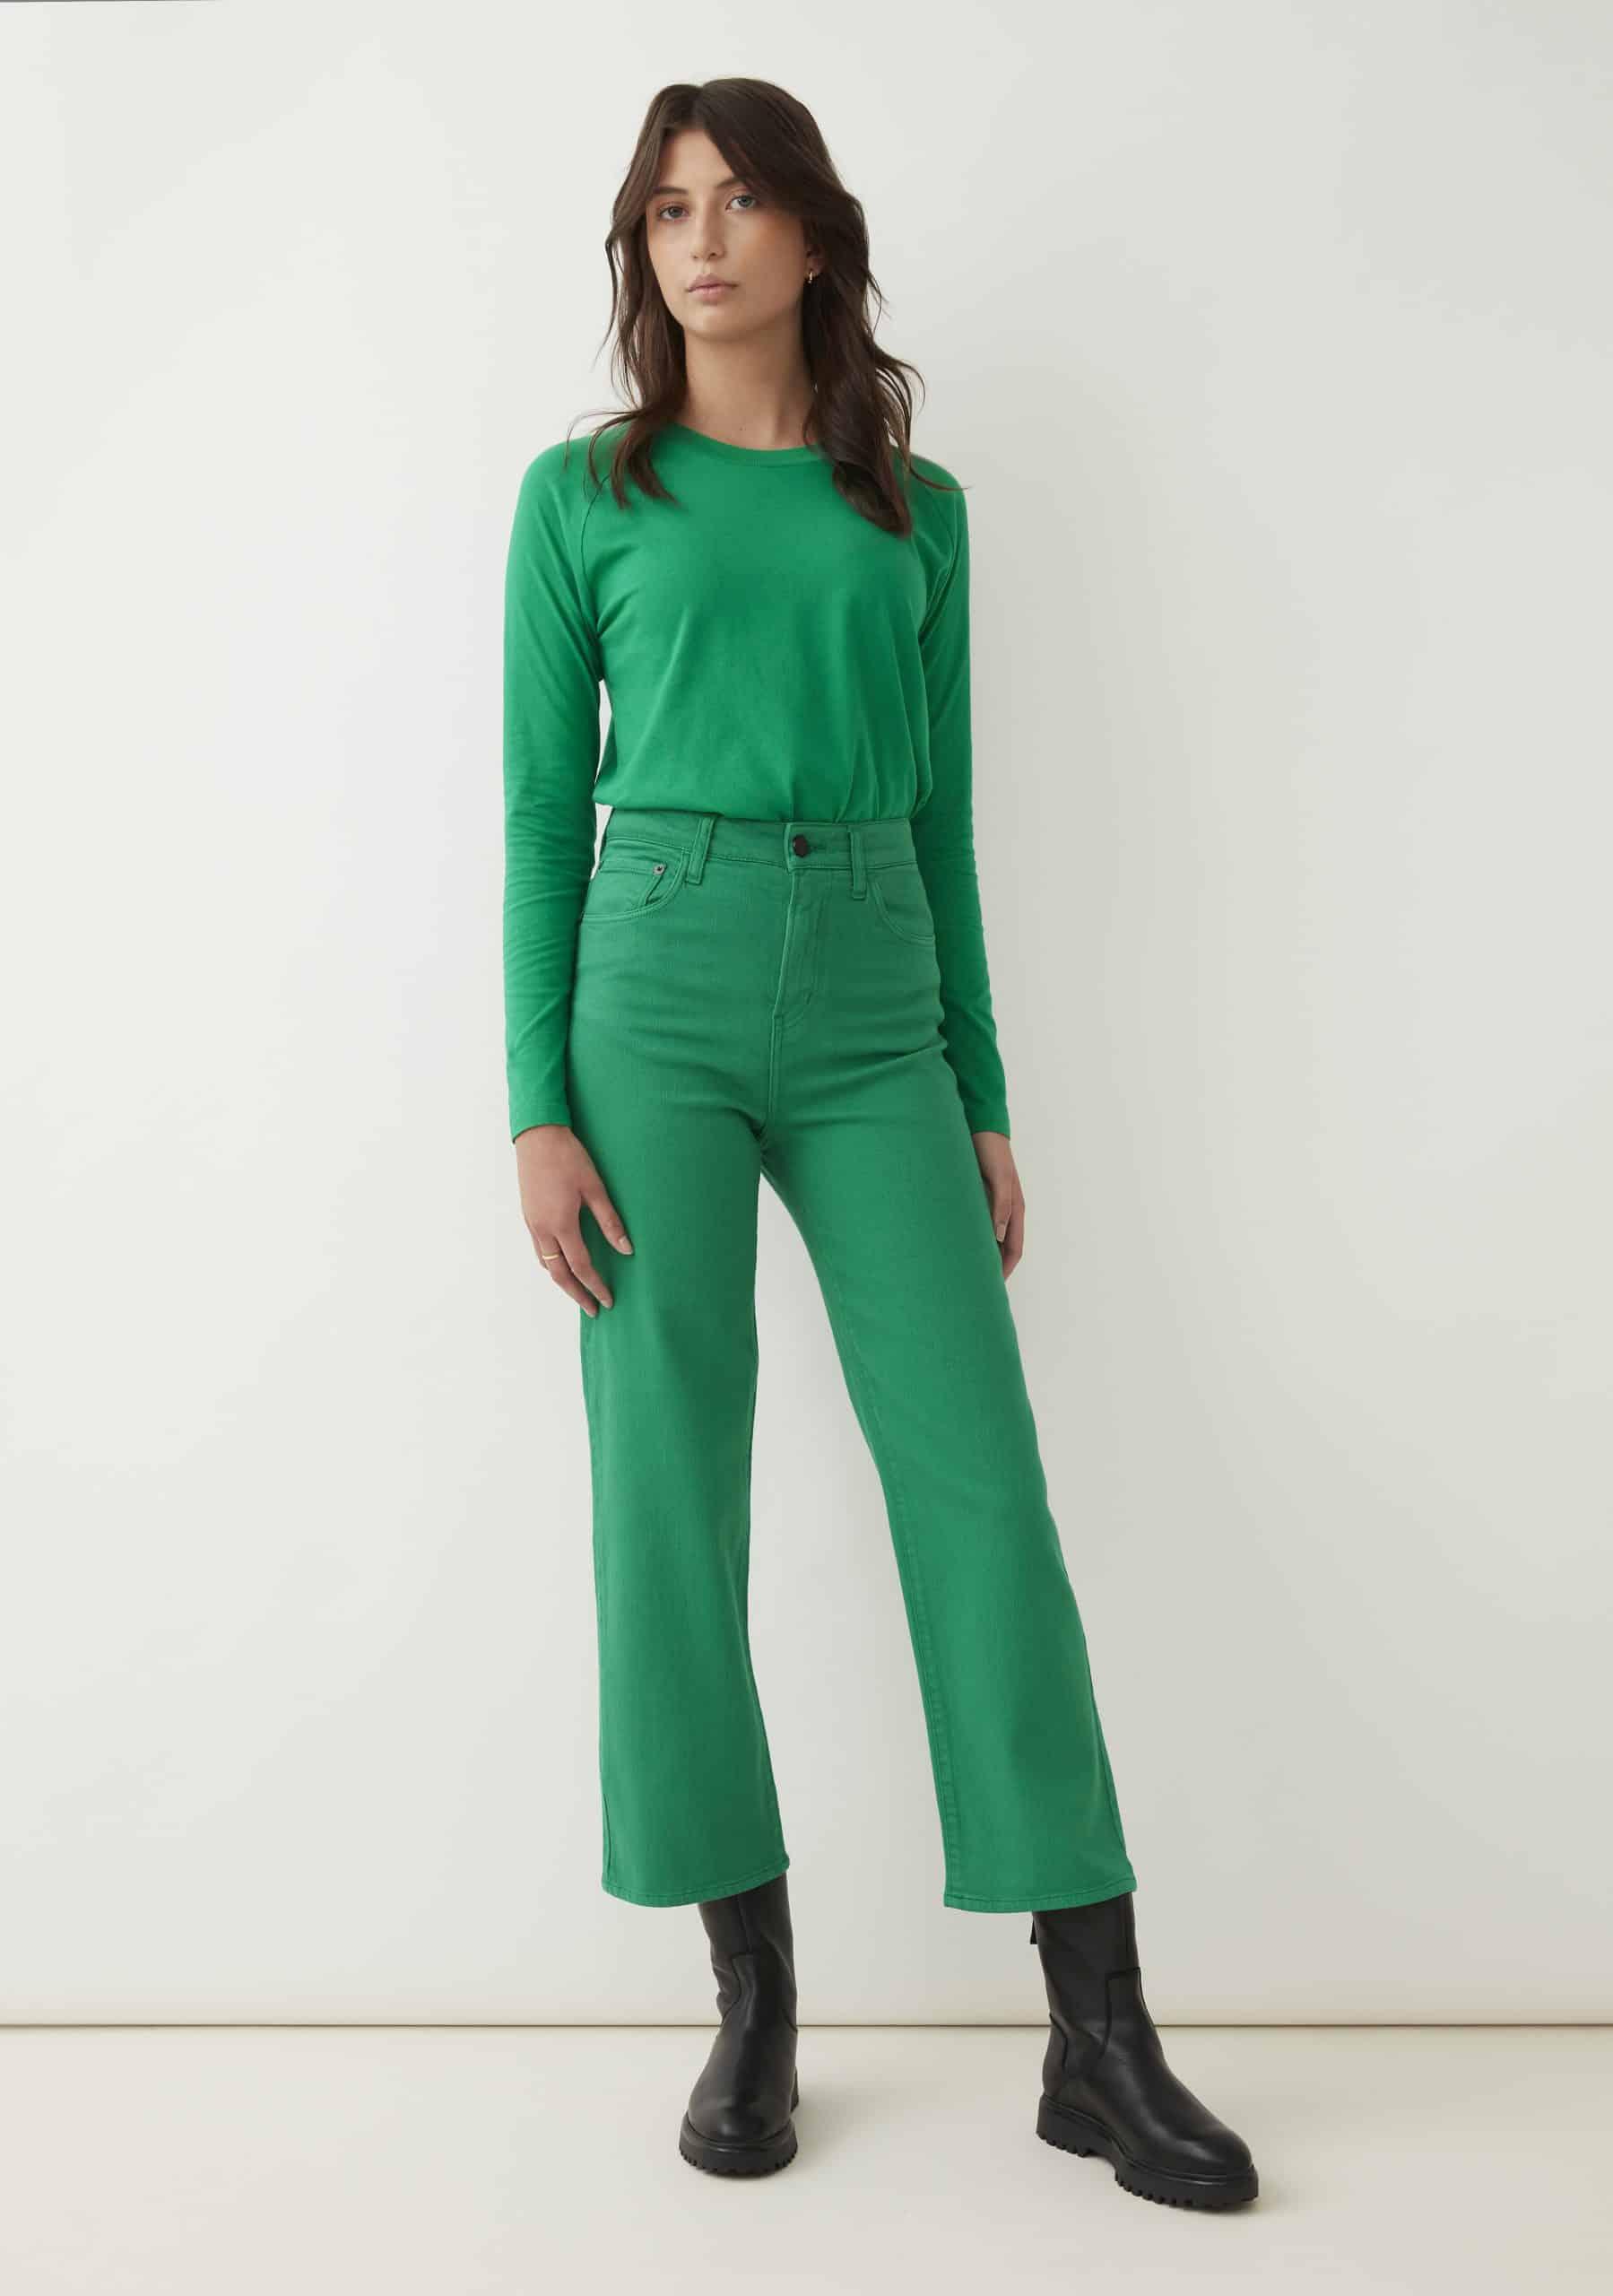 PHOEBE Top-Emerald